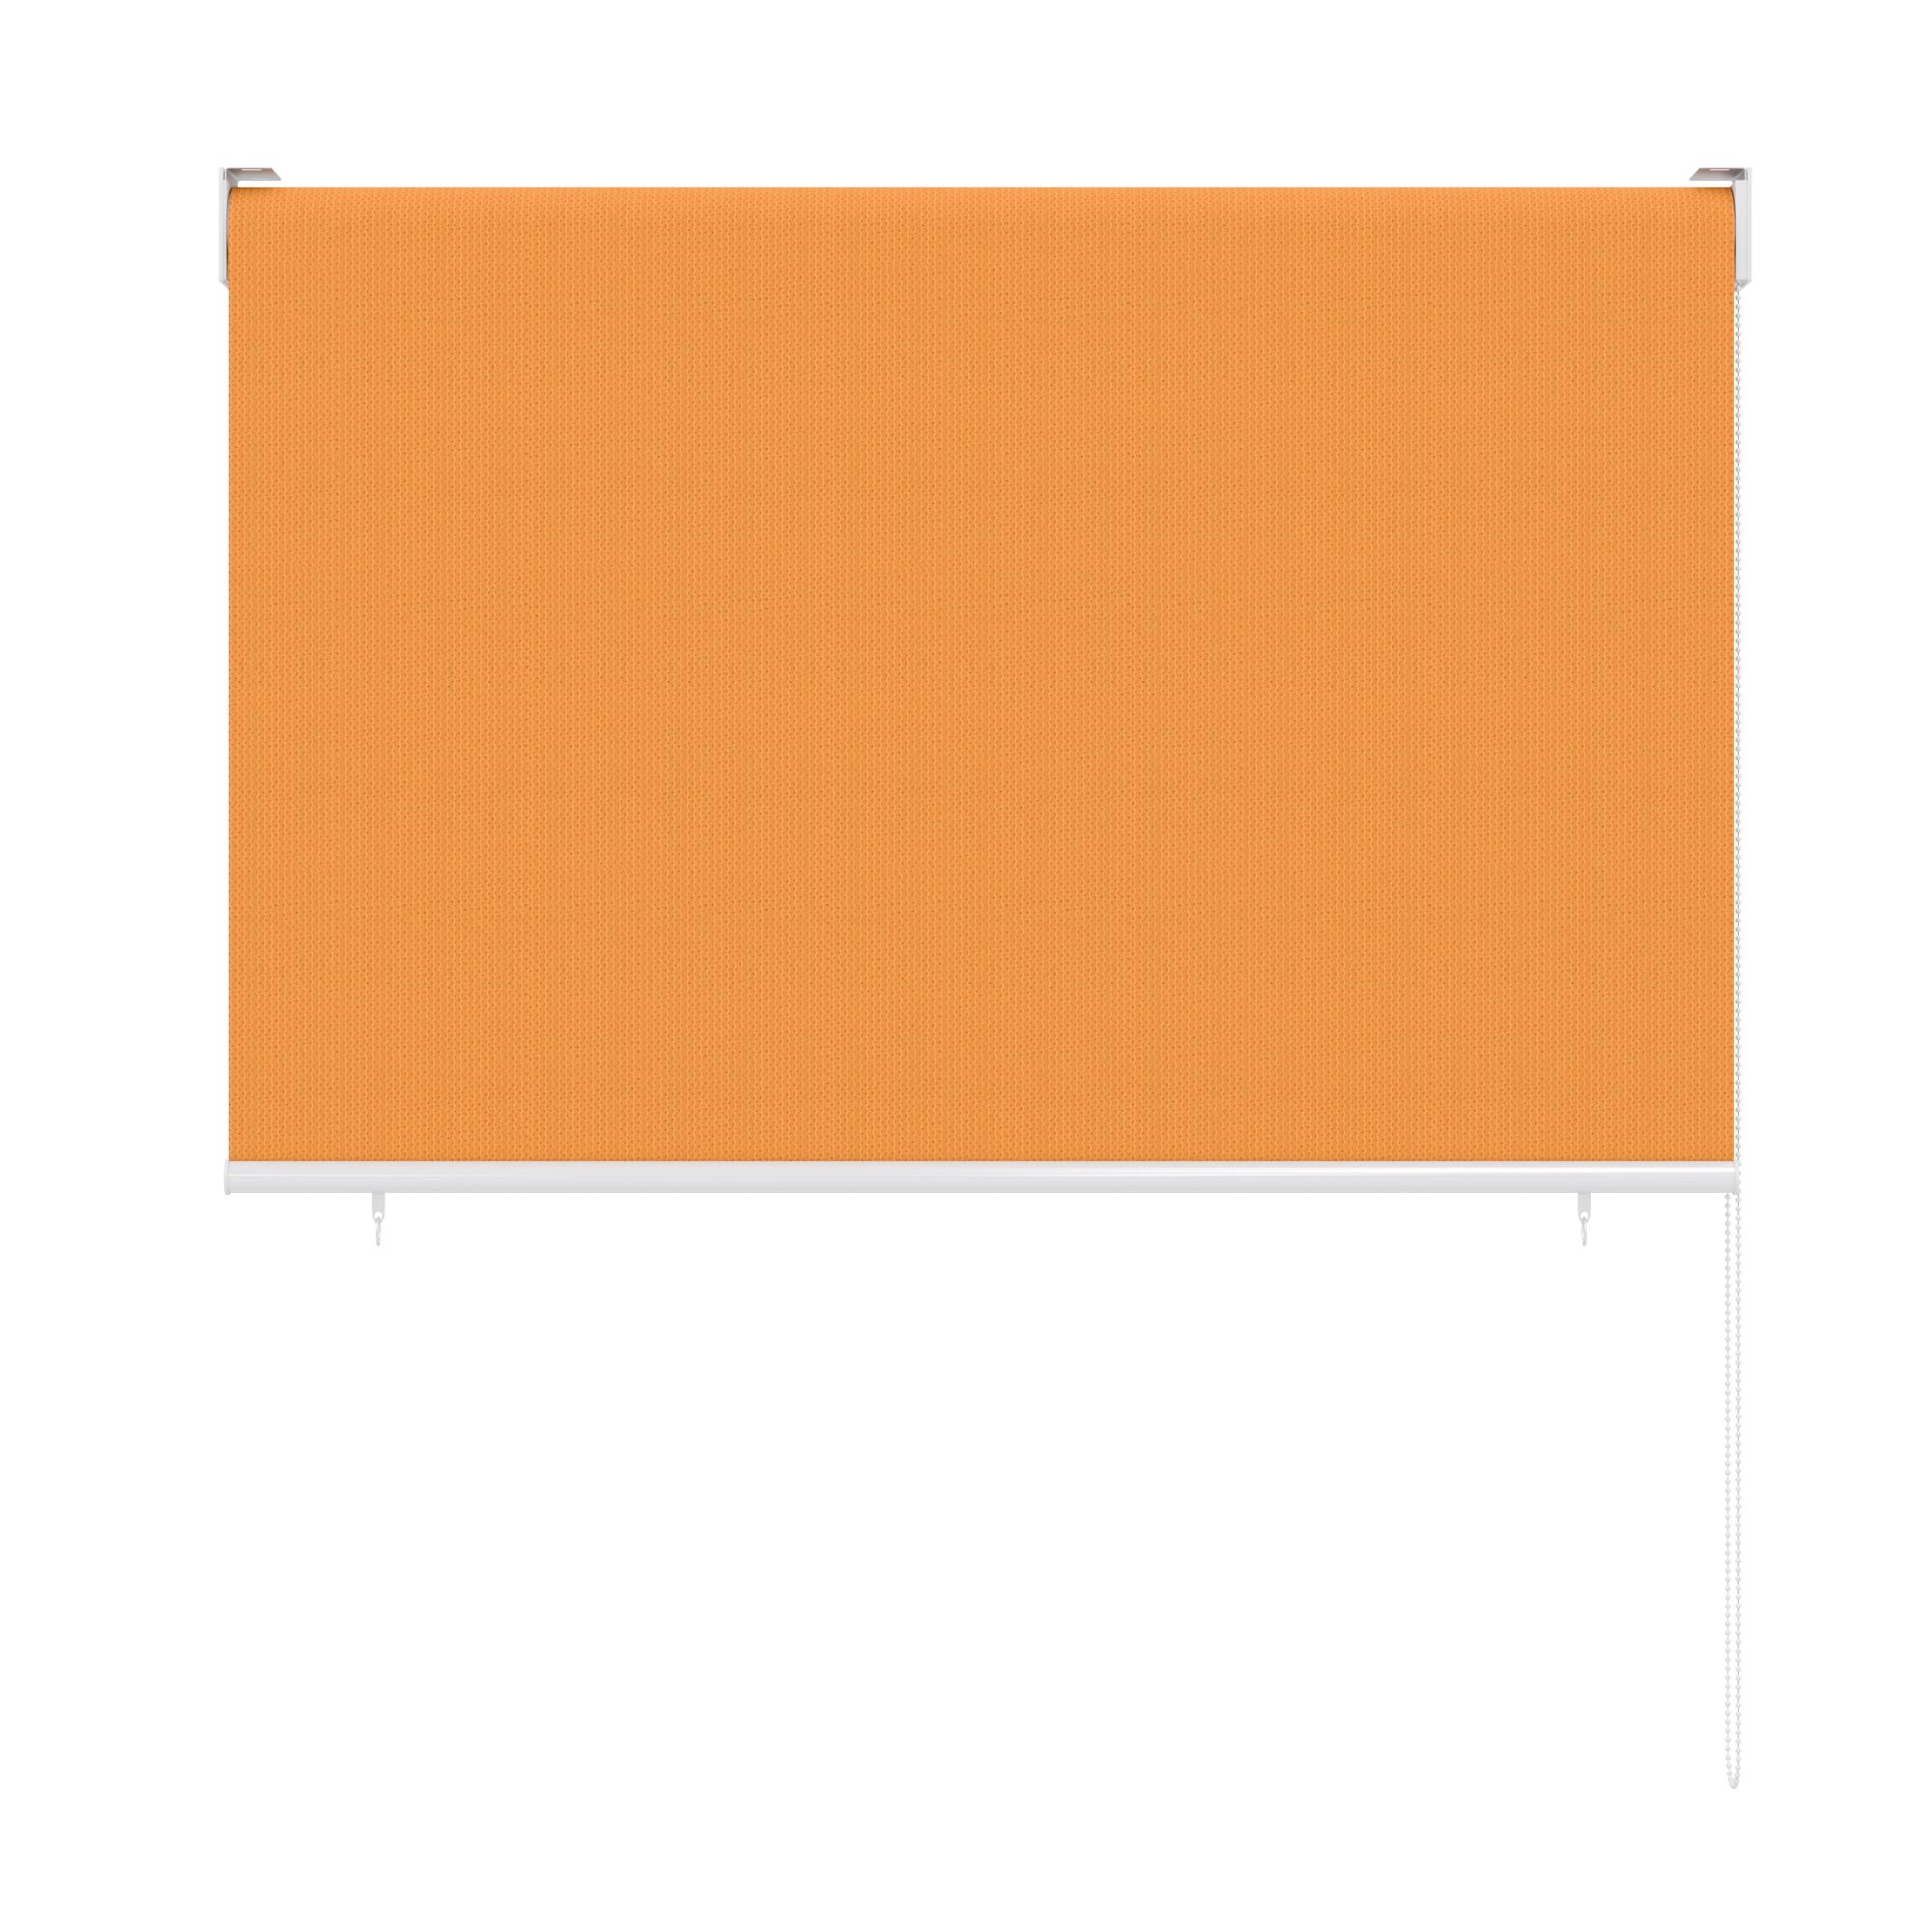 JAROLIFT-Senkrechtmarkise-Sichtschutz-Aussenrollo-Sonnenschutz-Aussen-Rollo-Balkon Indexbild 9